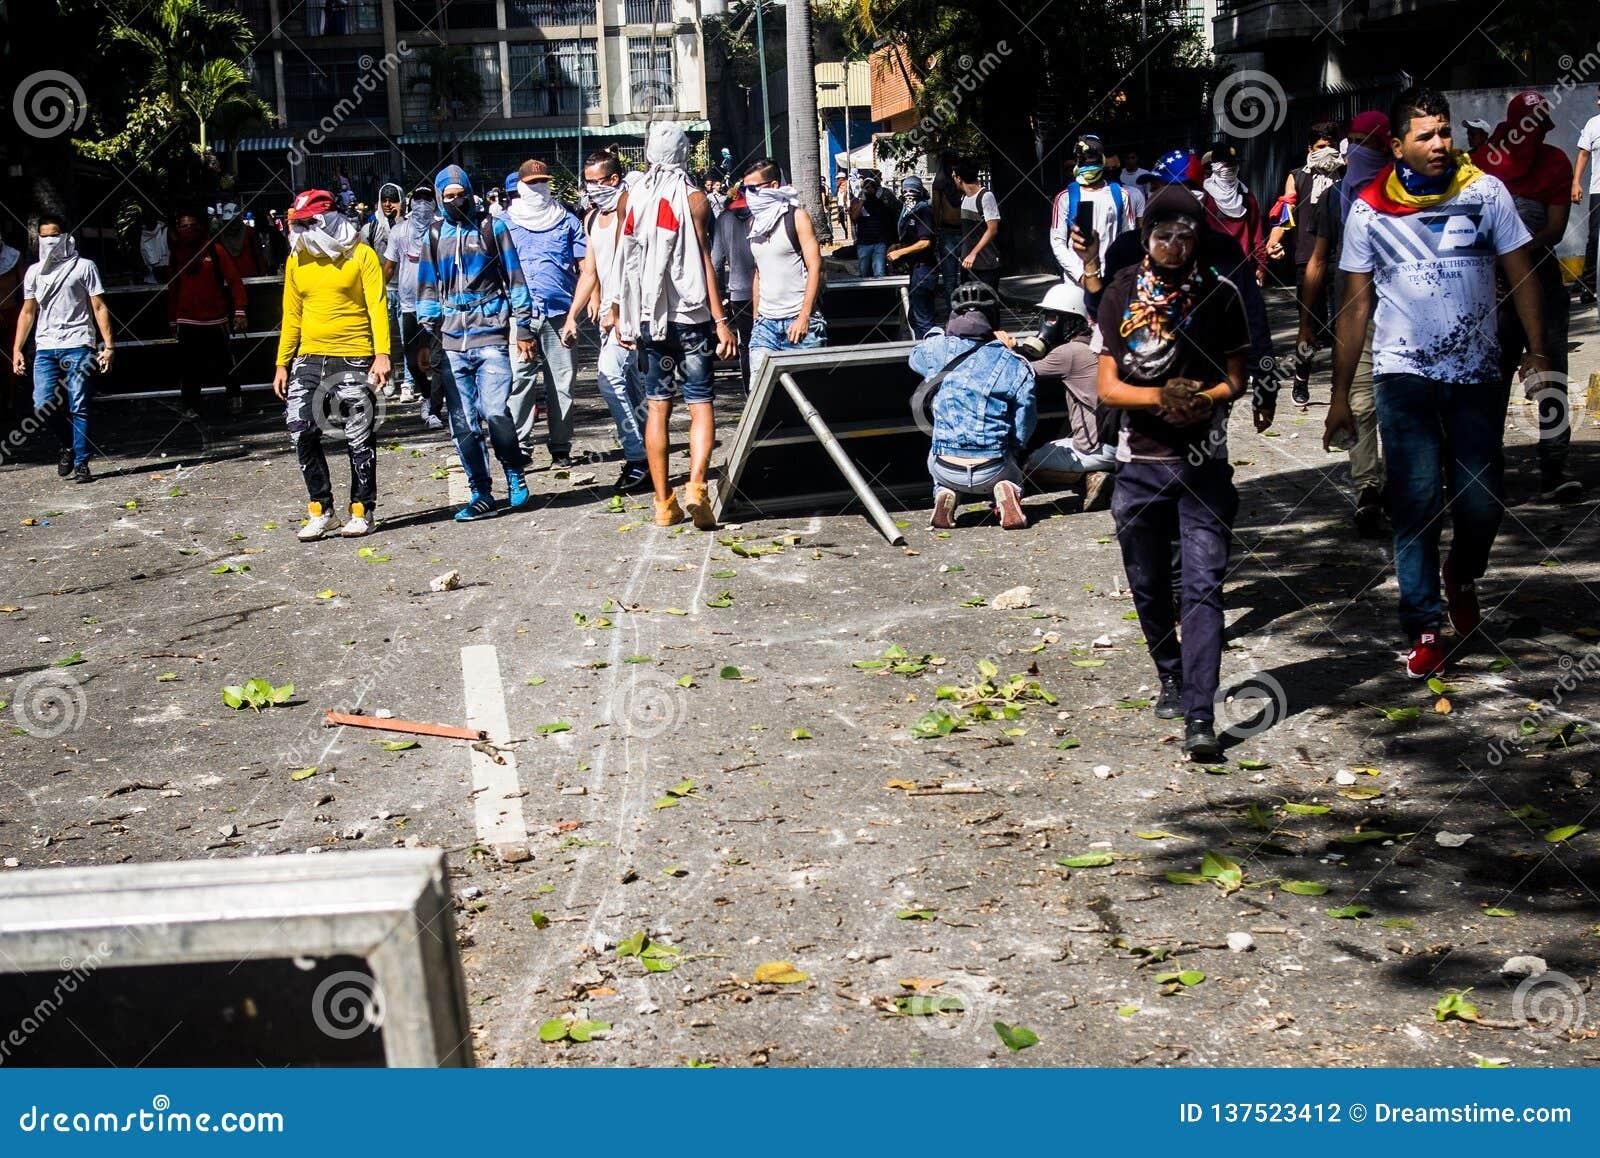 23-01-2019 Venezuelan Protestants take to the streets to express their discontent at the illegitimate takeover of Nicolas Maduro